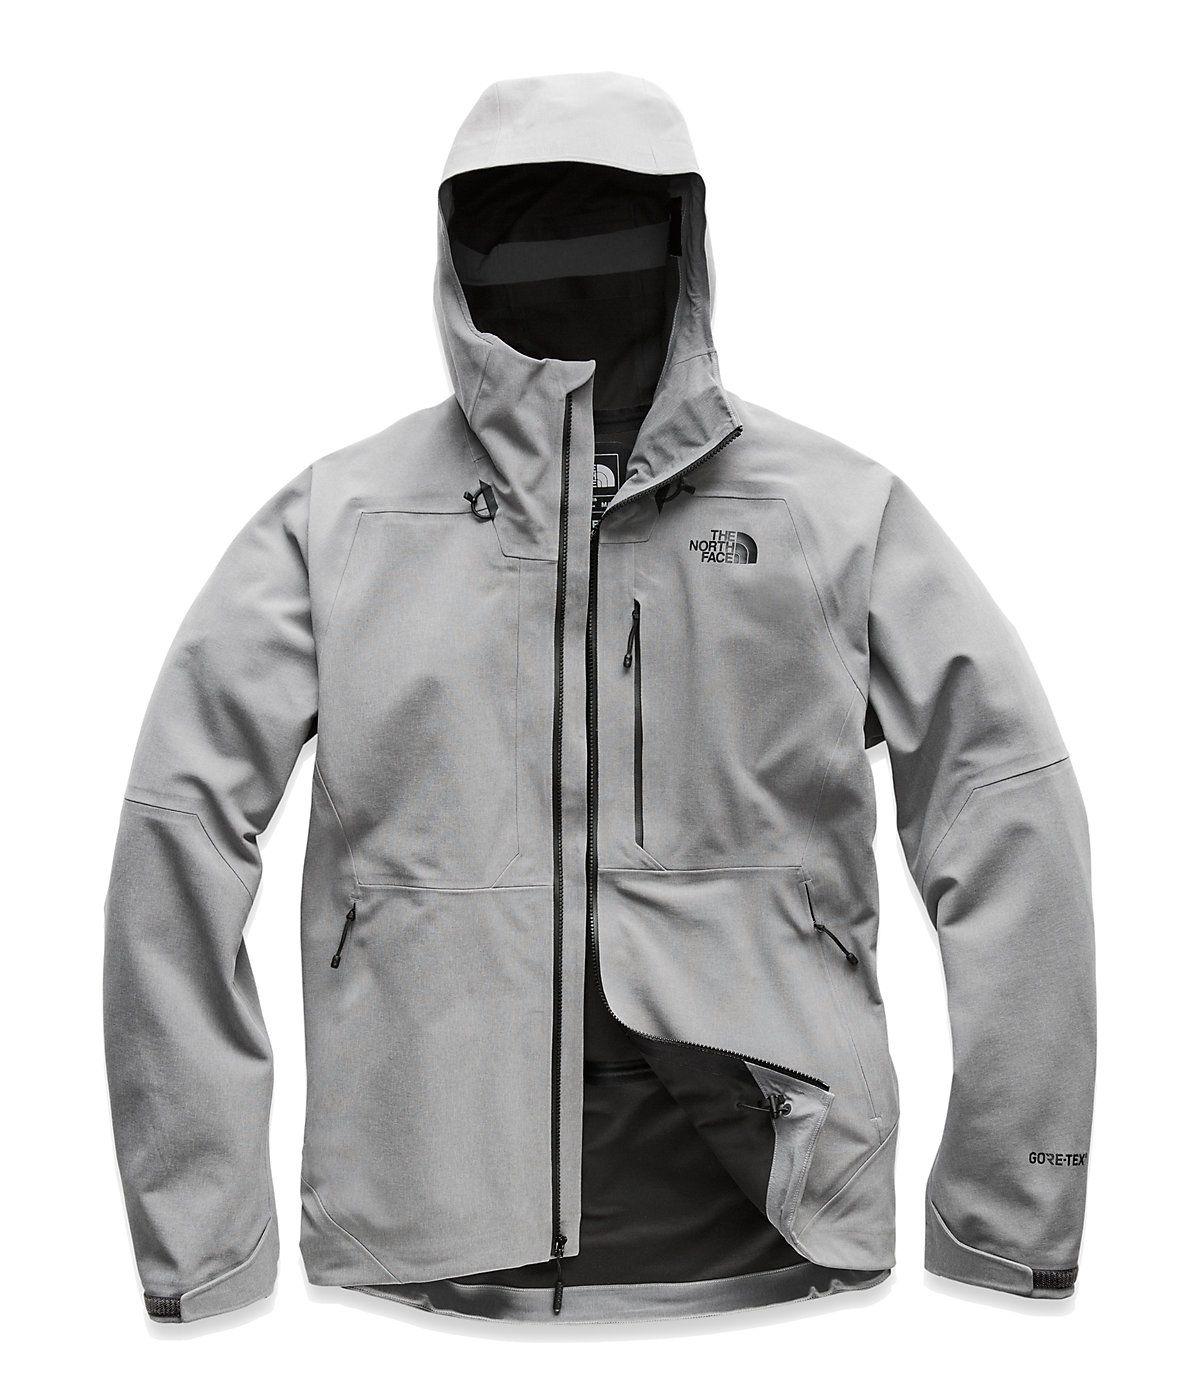 7e89cf3c6 Men's apex flex gtx®2.0 jacket in 2019 | Products | Waterproof ...